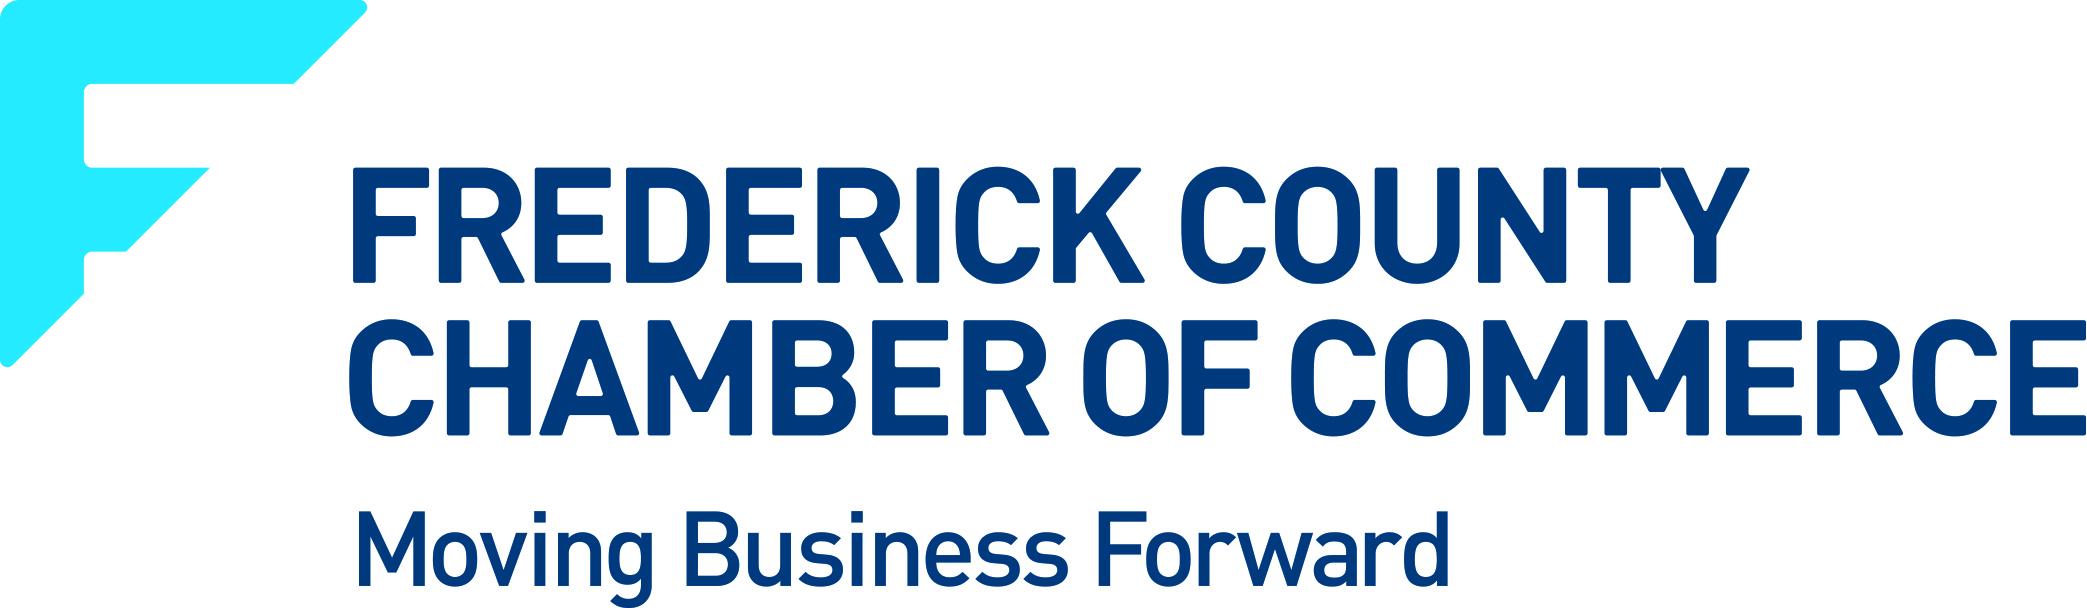 Frederick Chamber Primary Logo Tagline-CMYK.jpg